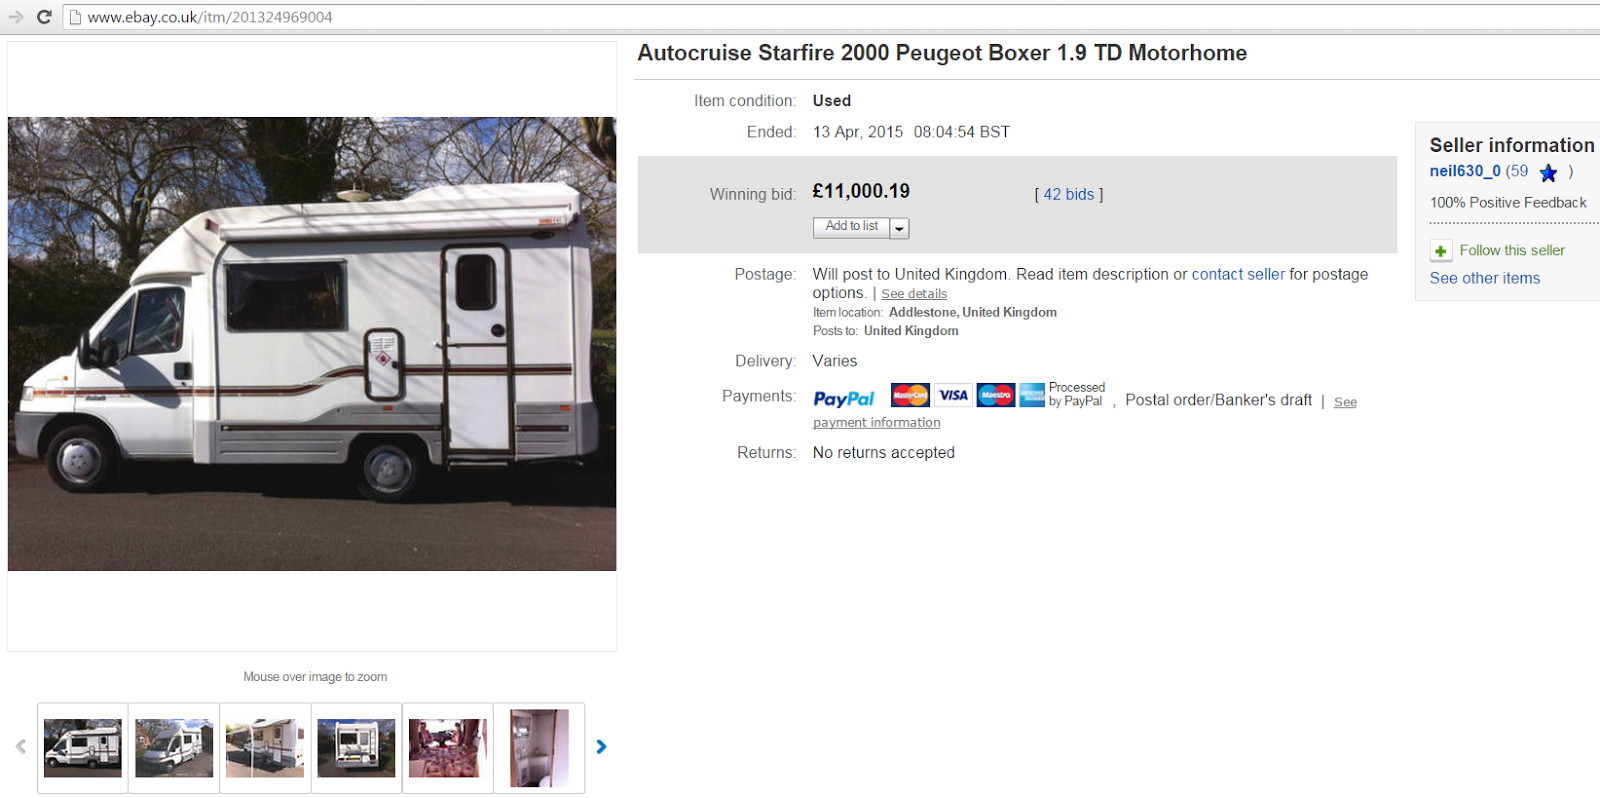 ebay scam : 2000 peugeot boxer 1.9 td motorhome autocruise